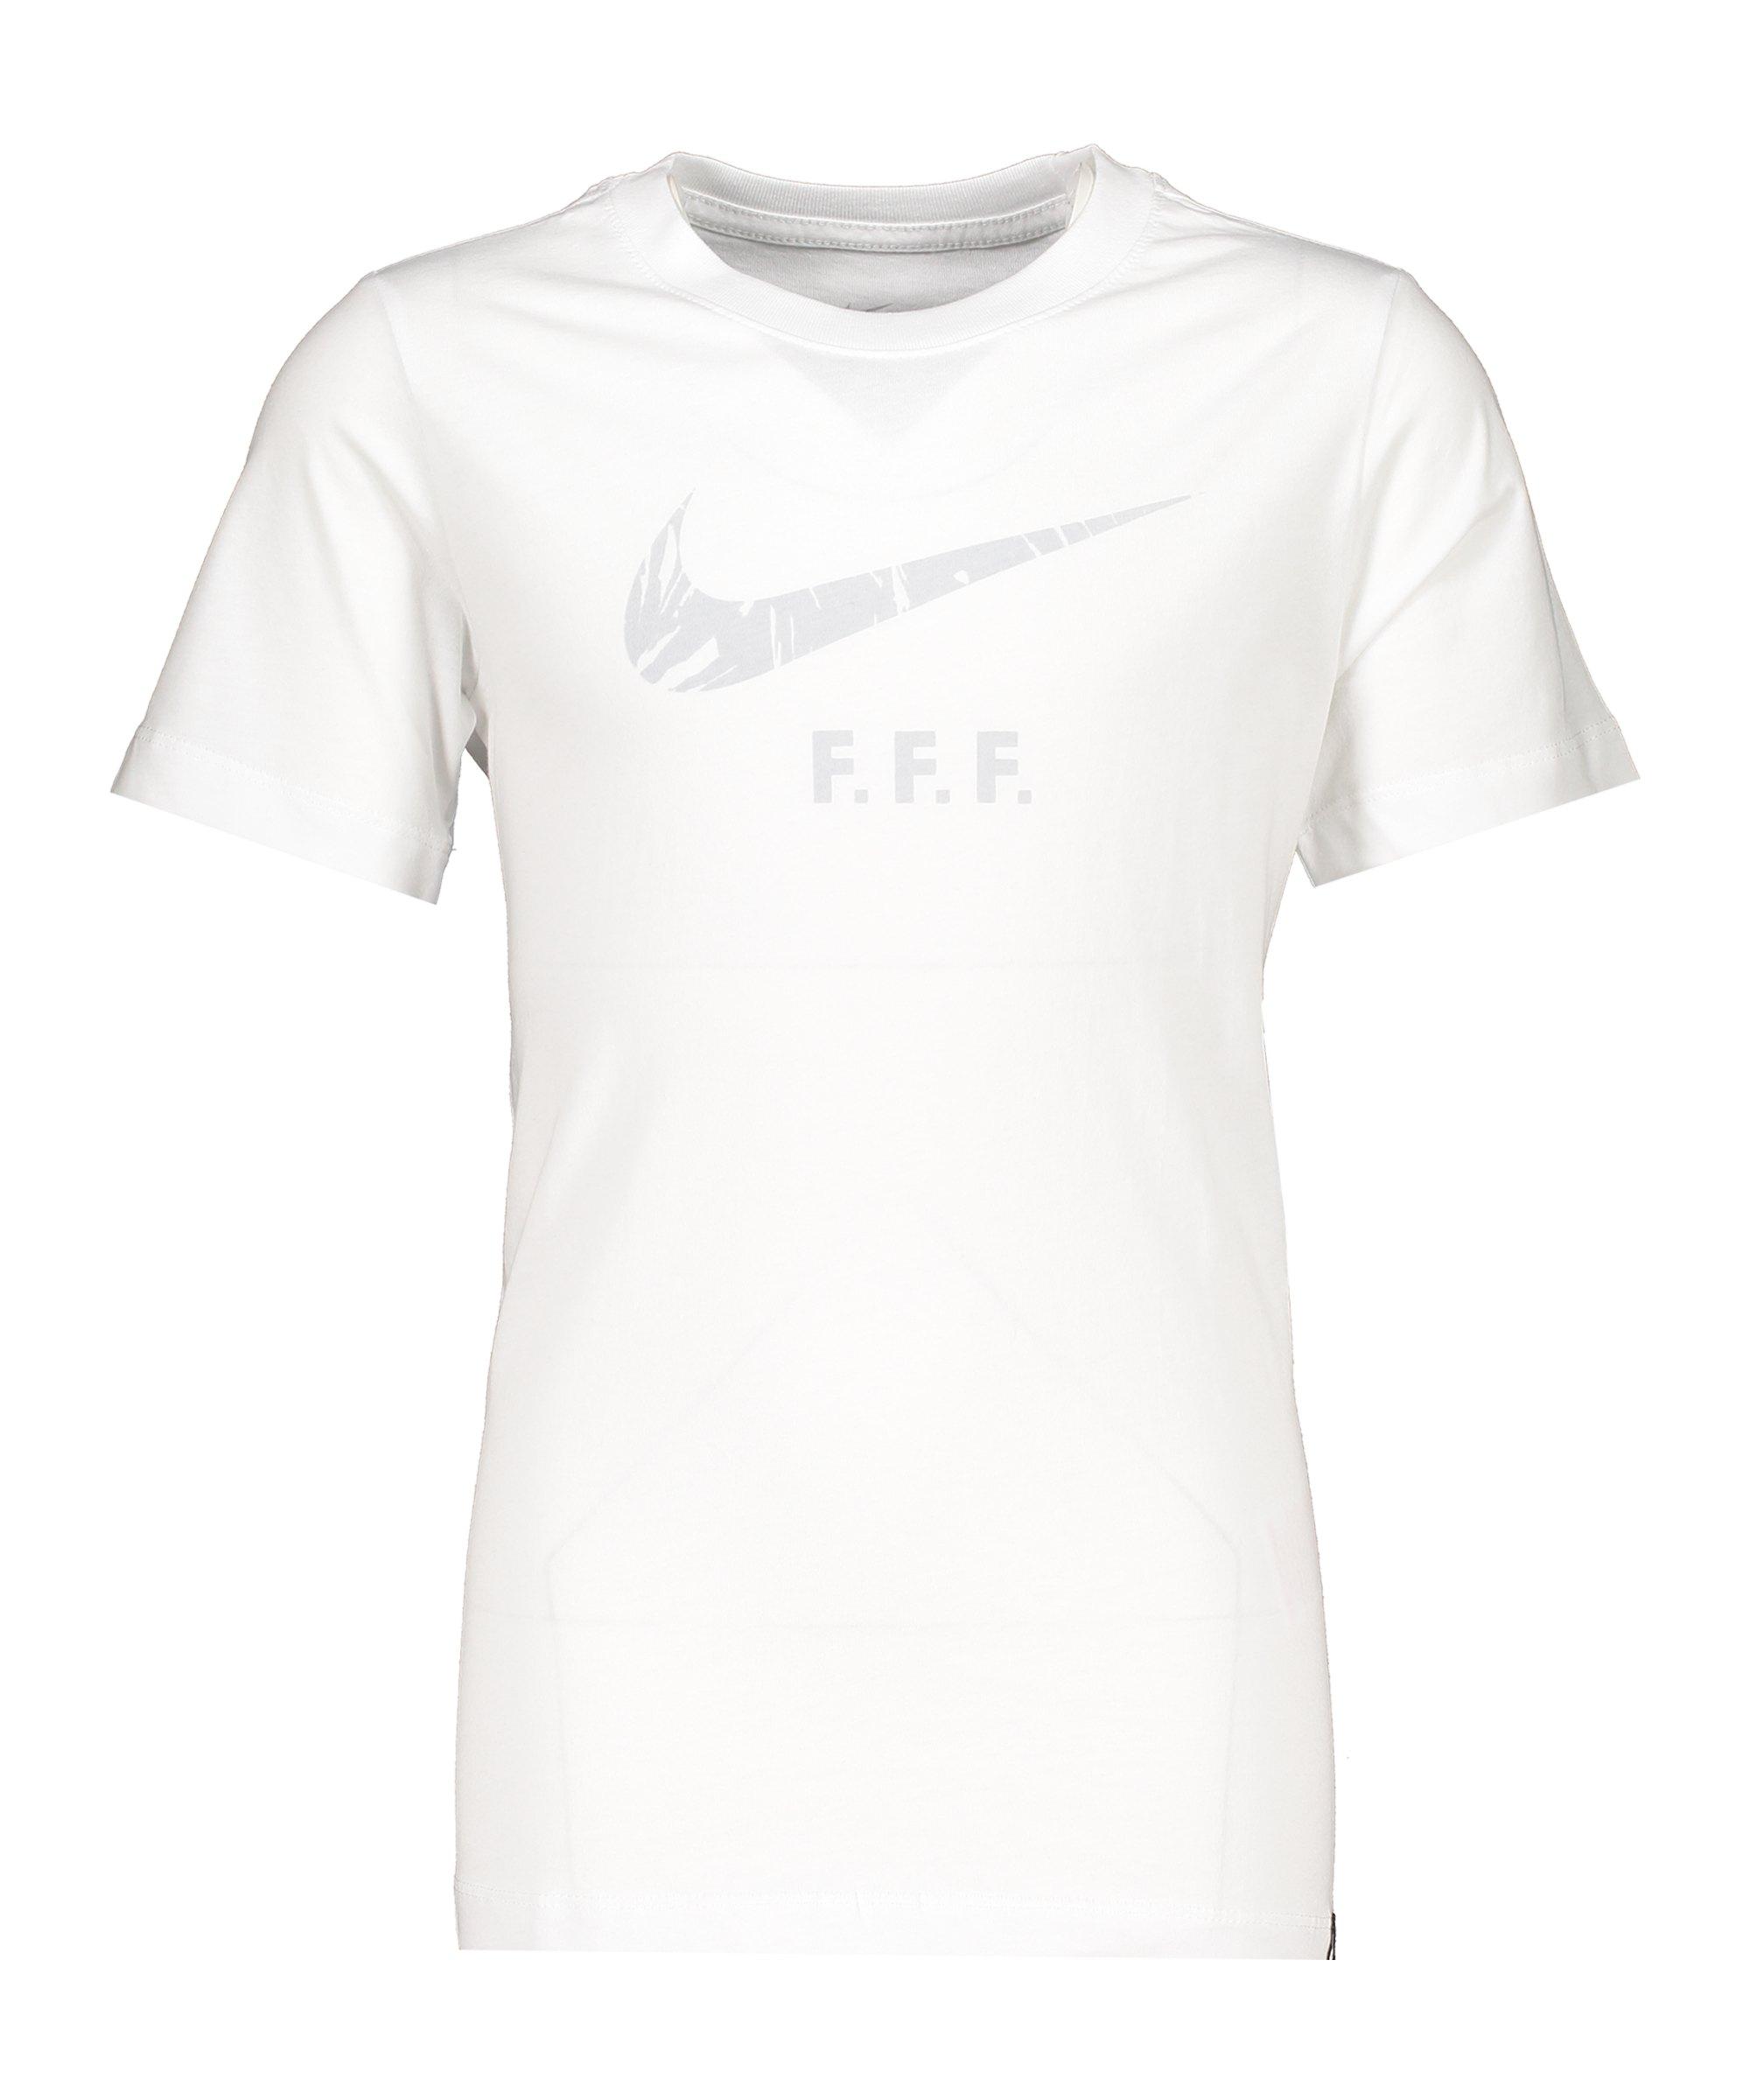 Nike Frankreich Ground Tee T-Shirt Kids Weiss F100 - weiss